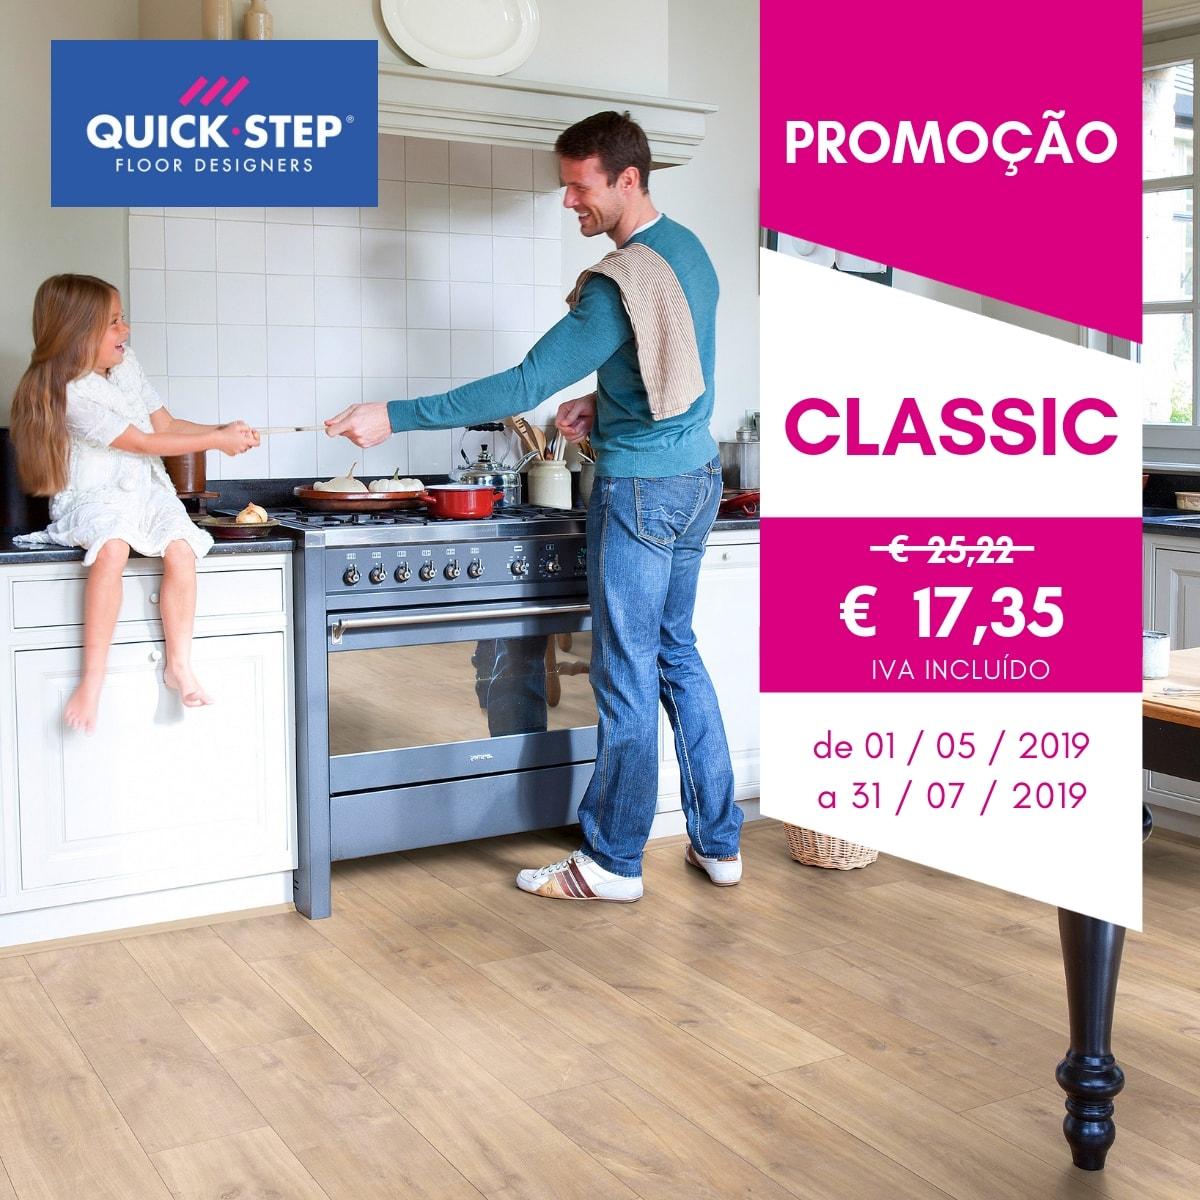 promocao-quick-step-classic.jpg